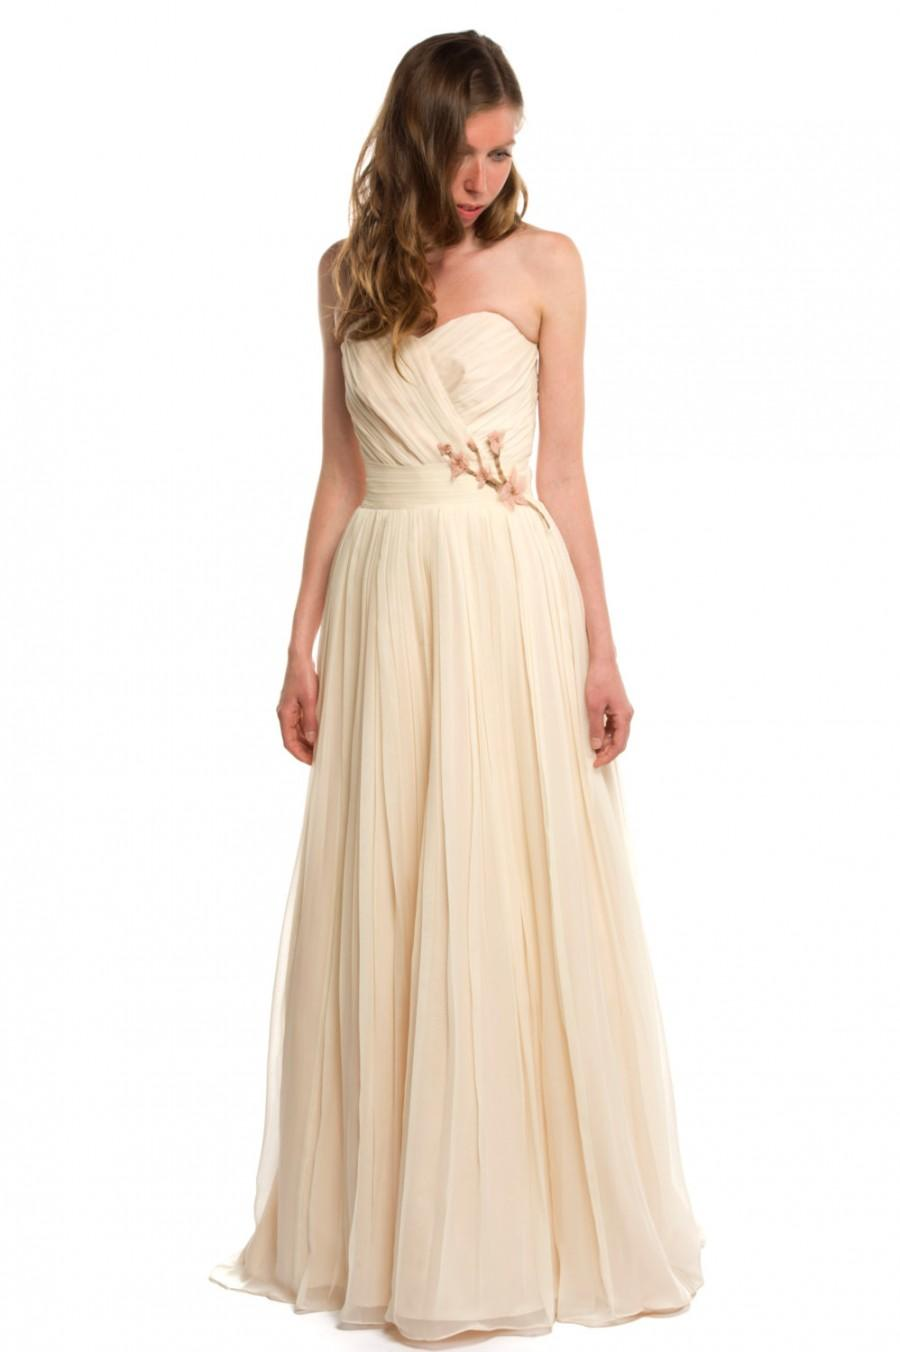 Cherry Blossom Wedding Dress, Chiffon, Custom Made To Order In Your ...